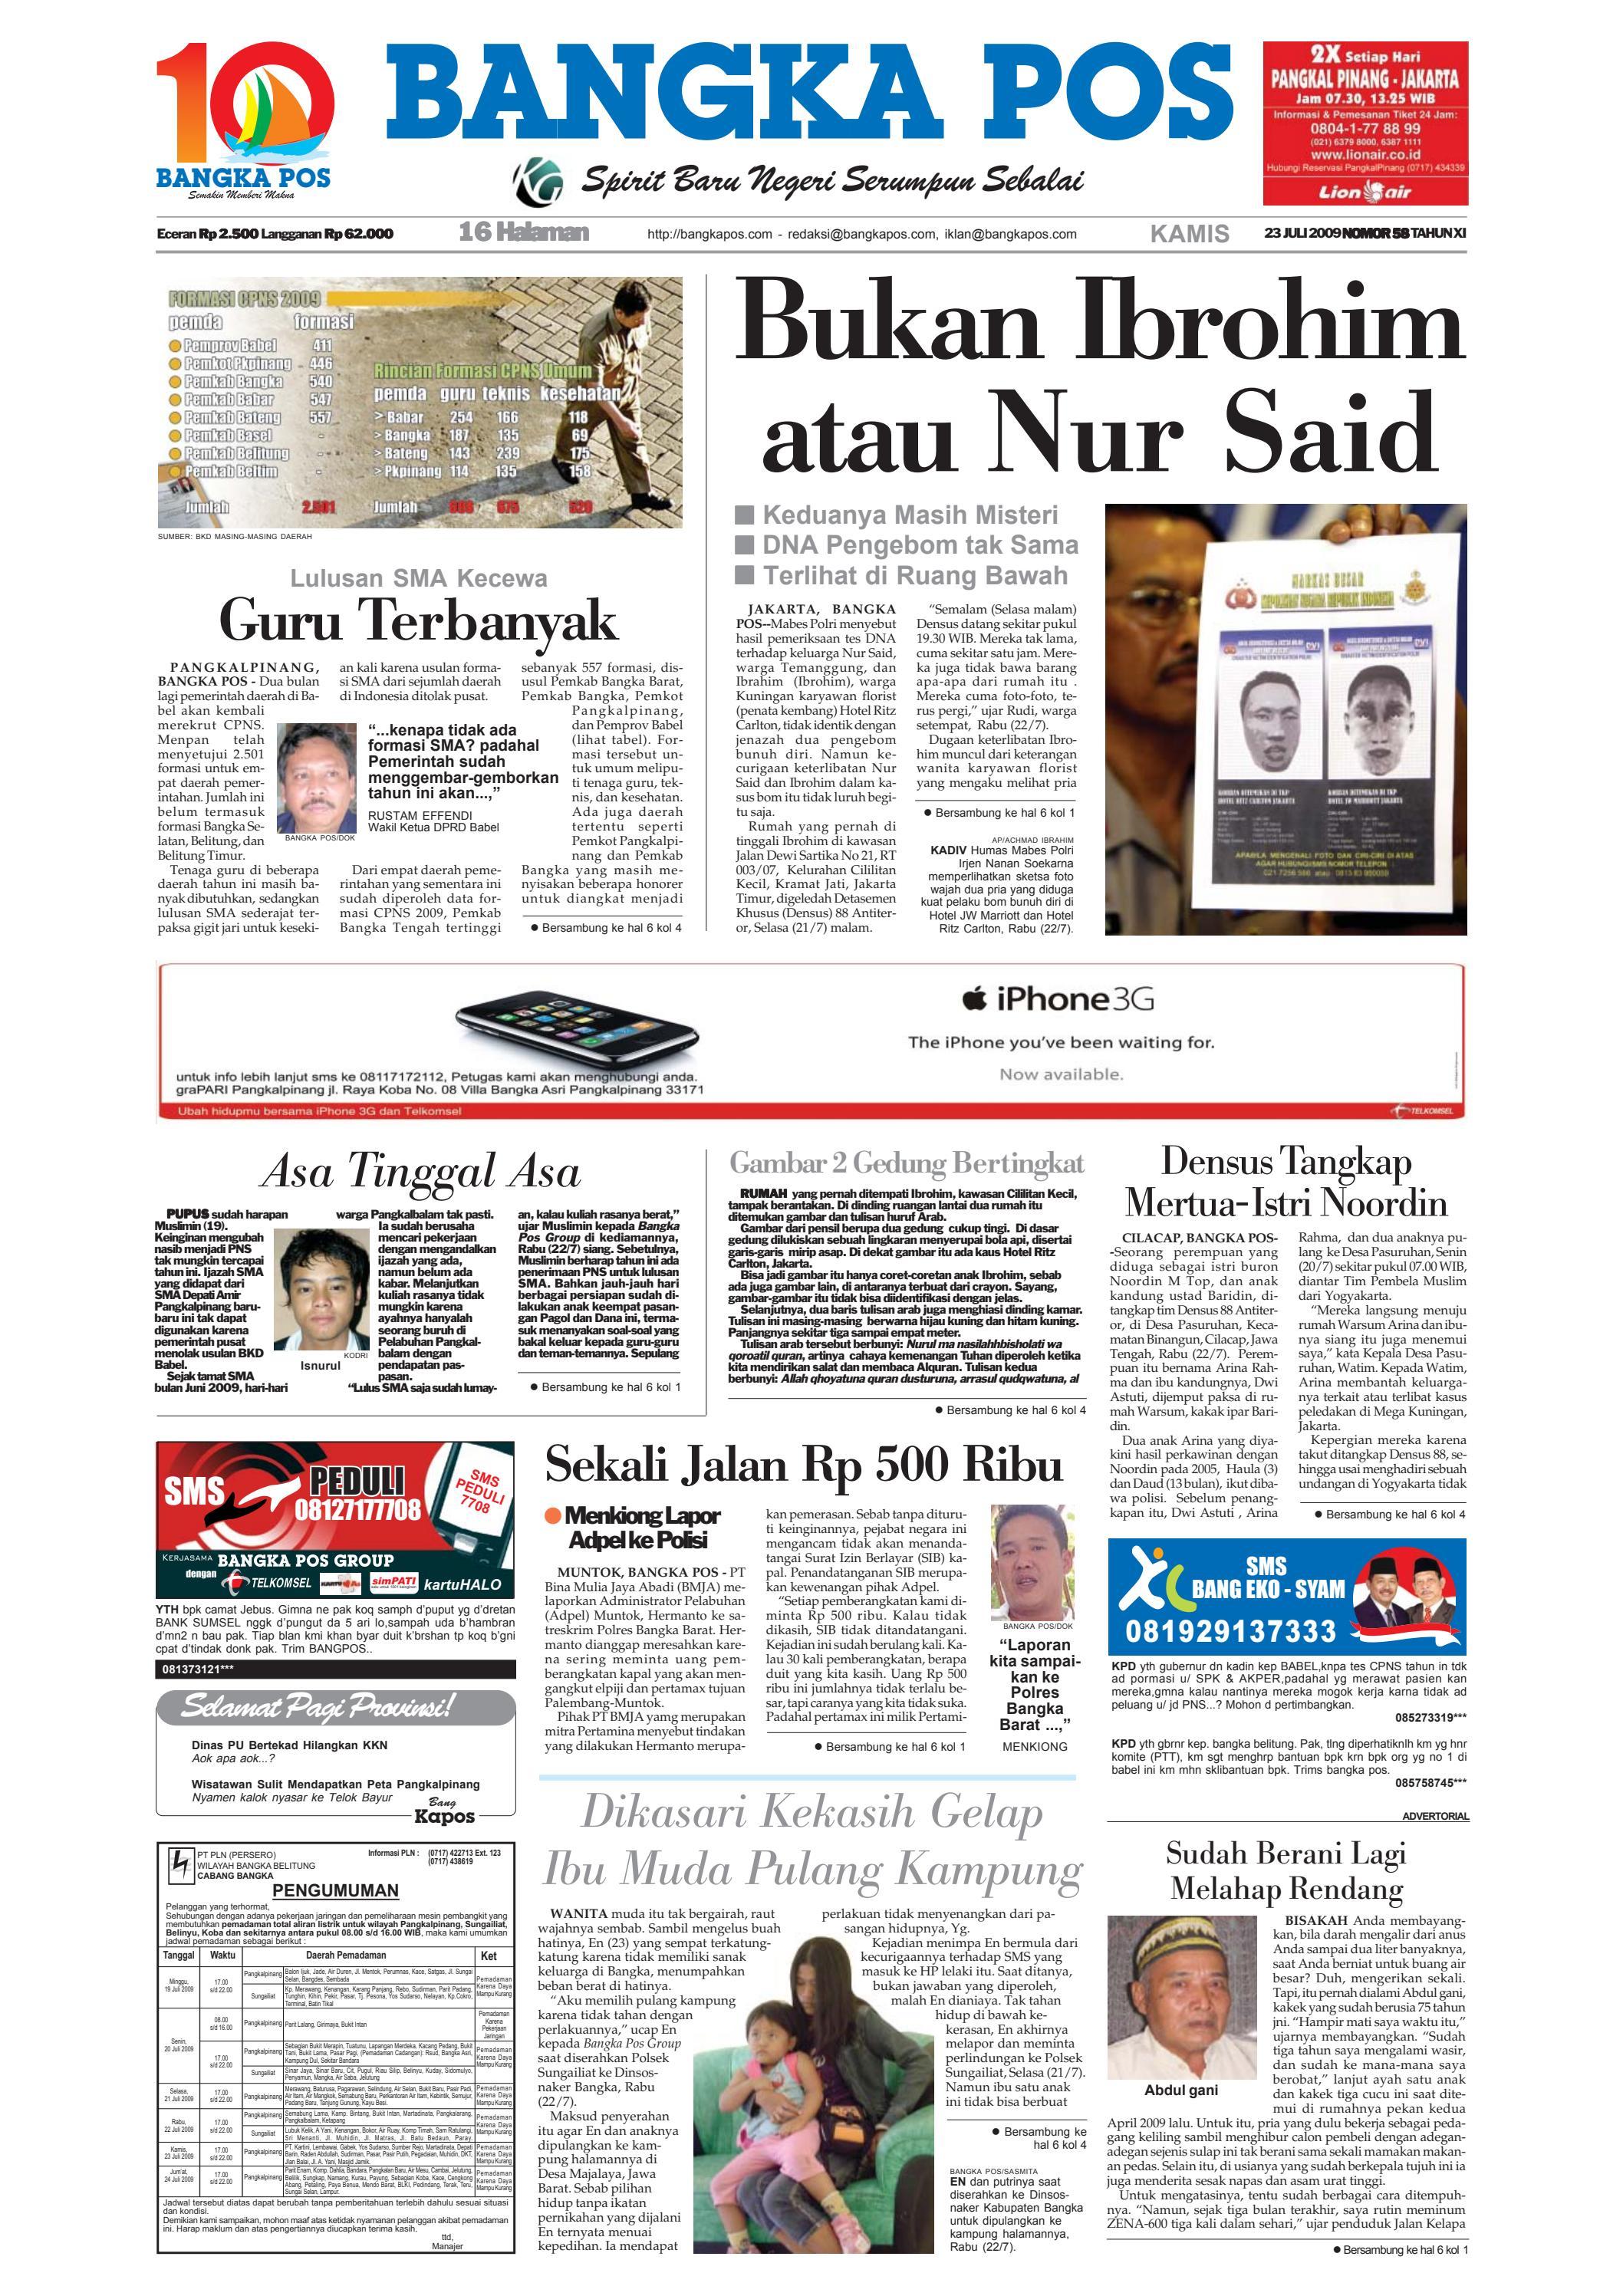 Harian Pagi Bangka Pos Edisi 23 Juli 2009 By Issuu Tcash Kartini Steam Wallet Sea 10